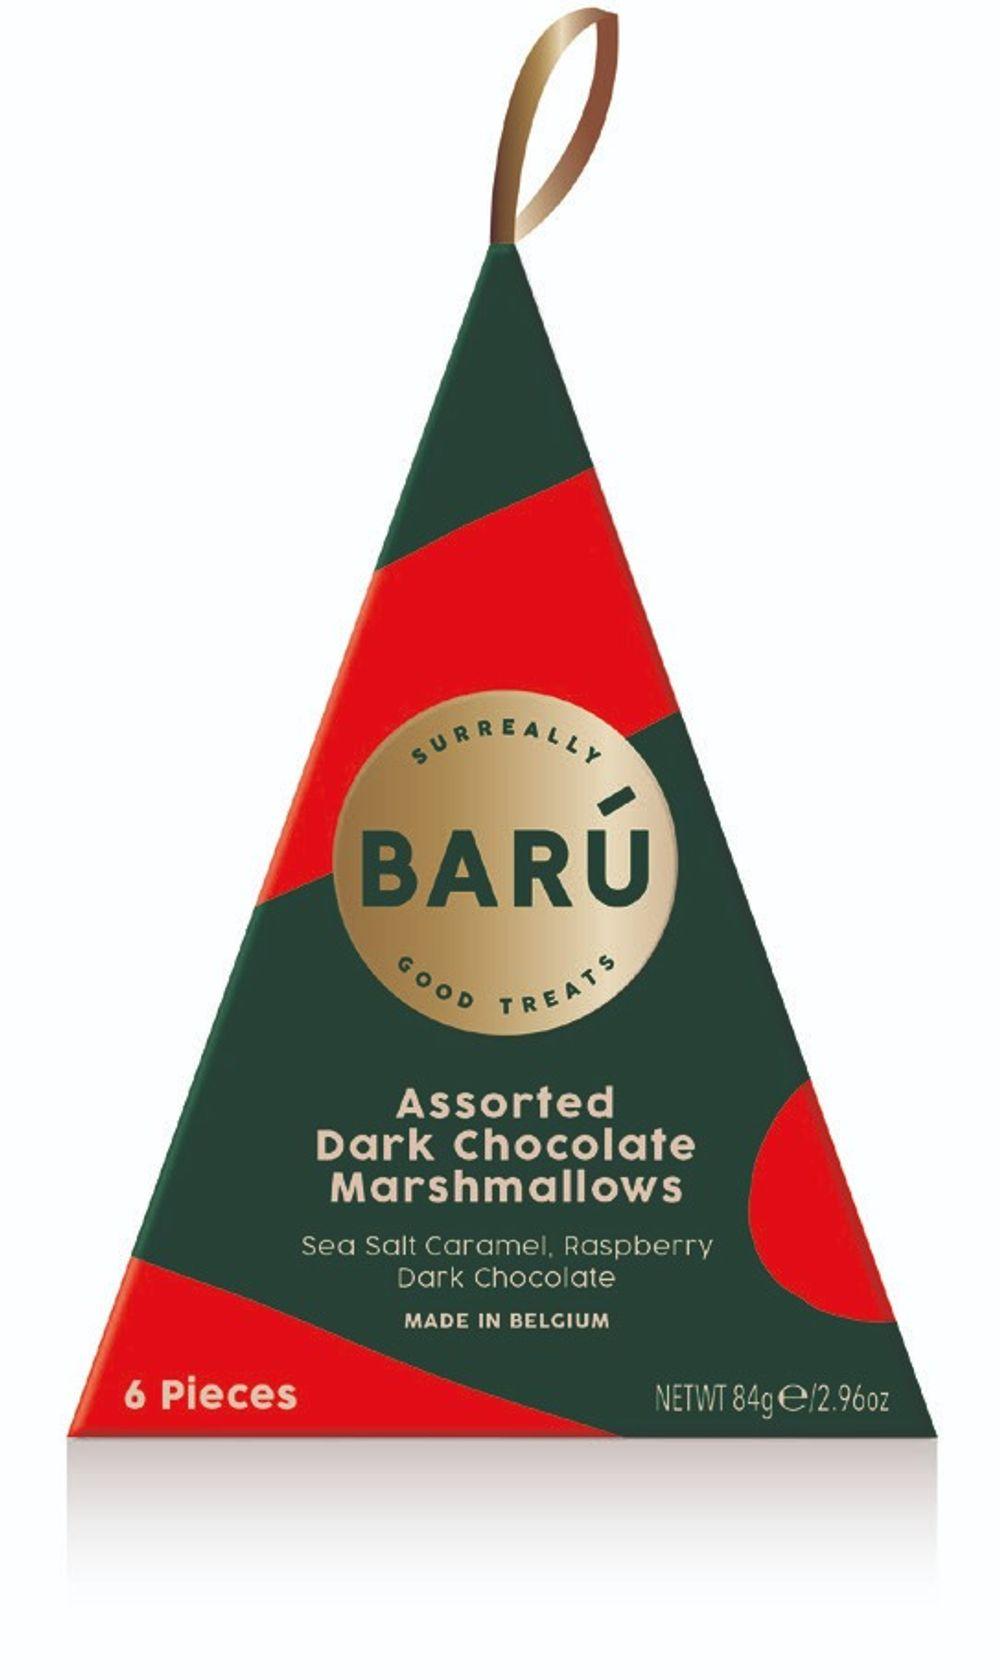 Assorted Dark Chocolate Marshmallows Tree Box